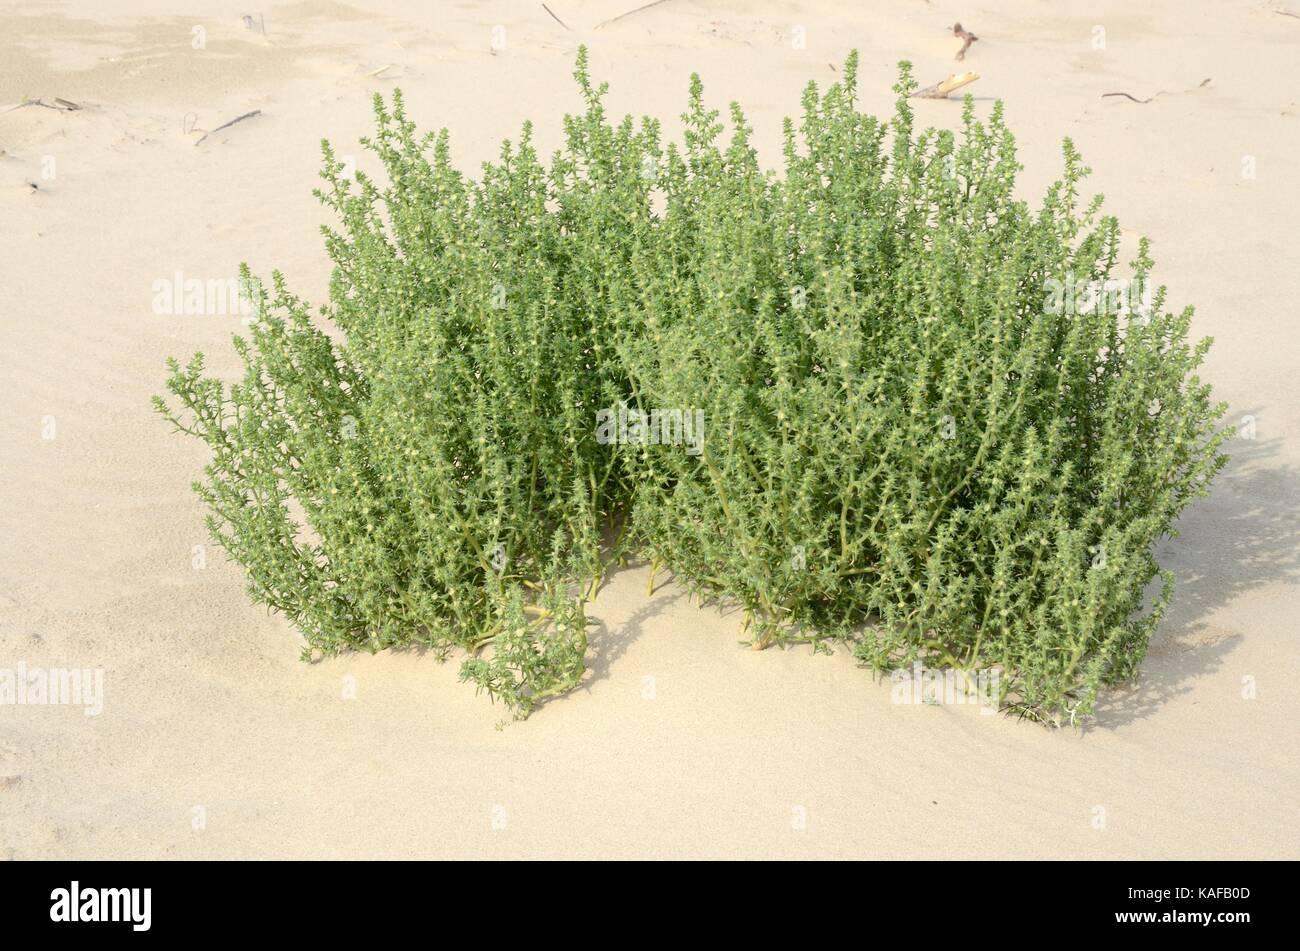 Saltwort Salsola kali growing on embryo dunes Pembrey Burrows and Saltings Local nature Reserve Millenium Coastal Stock Photo